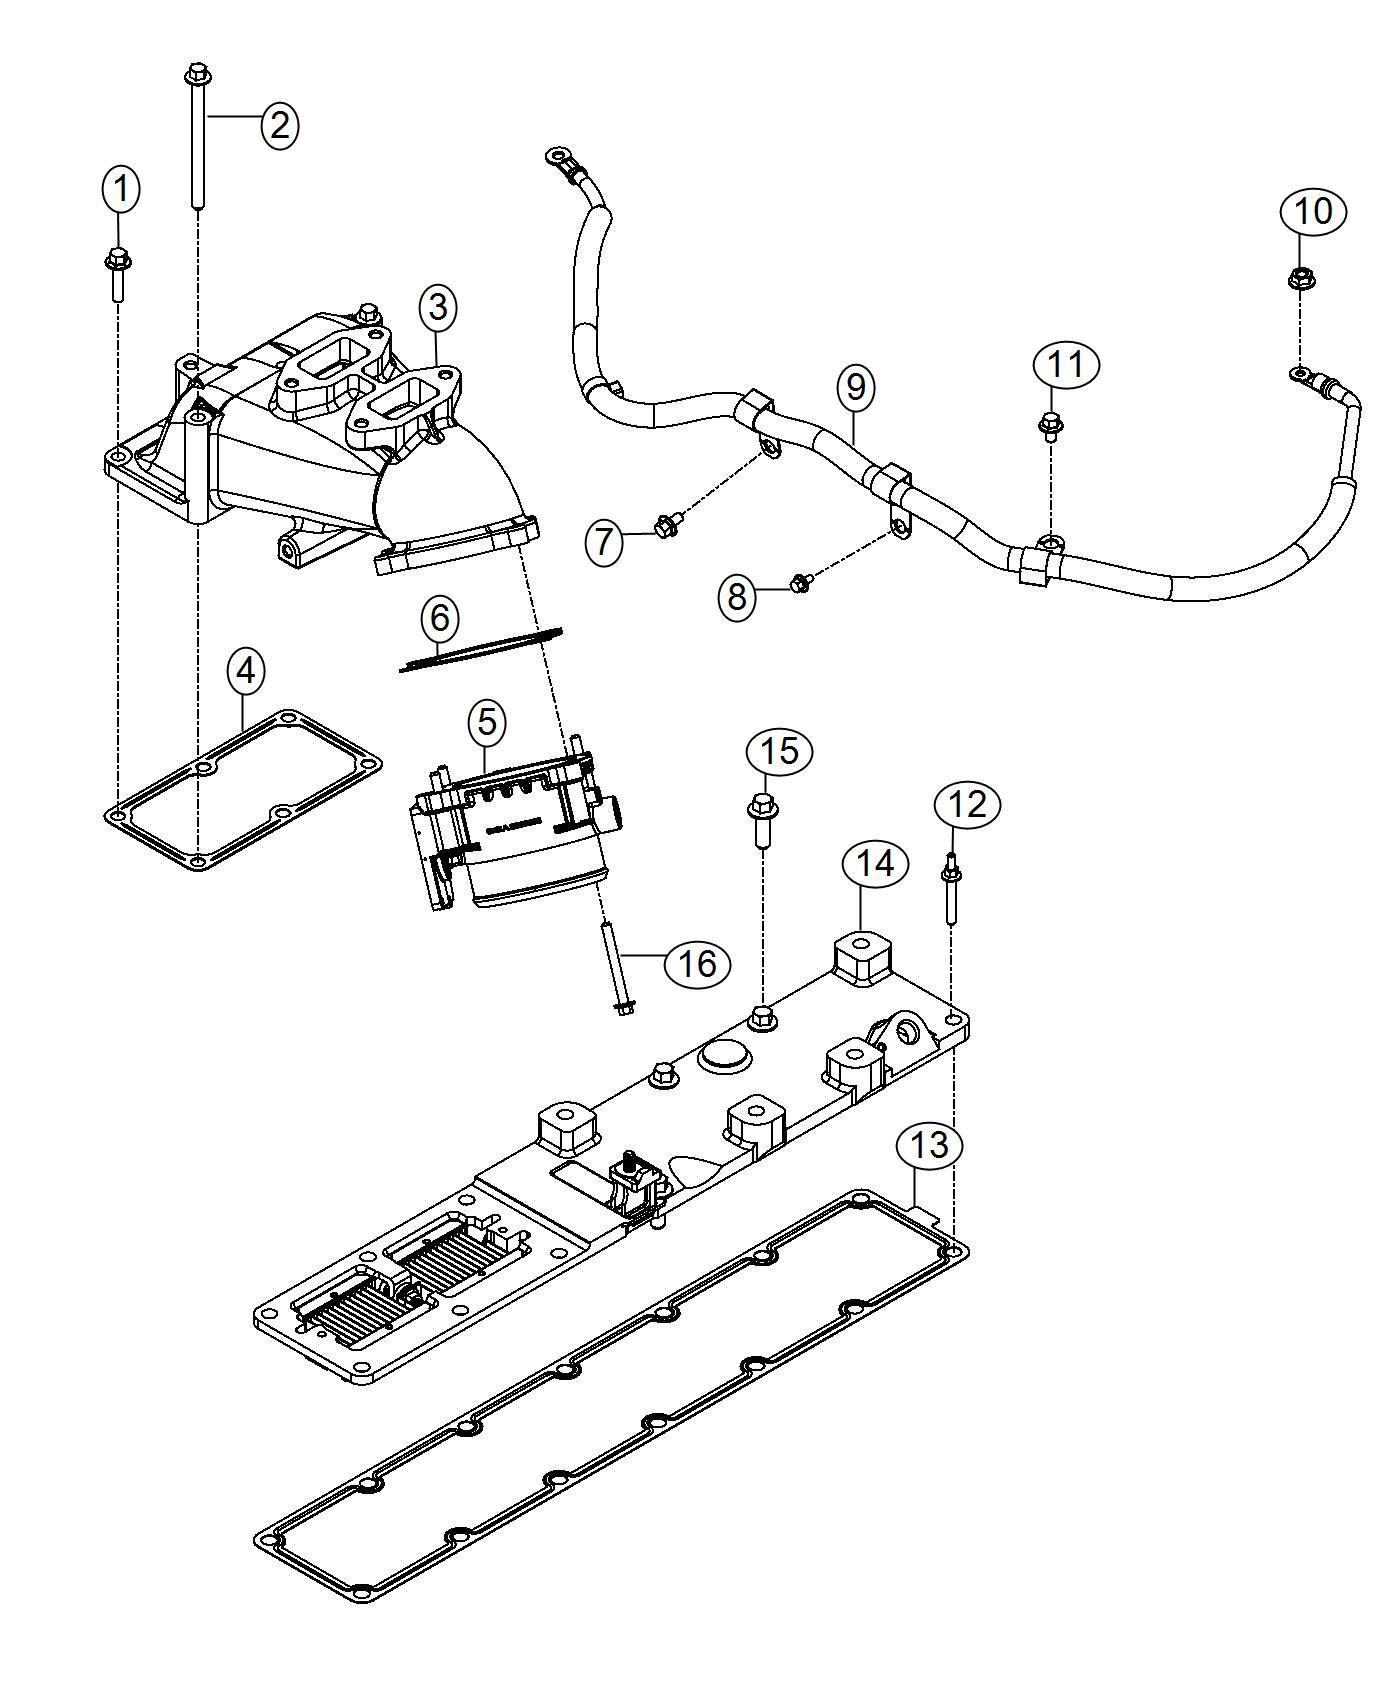 2013 Dodge Ram 4500 Wiring. Air intake heater, engine